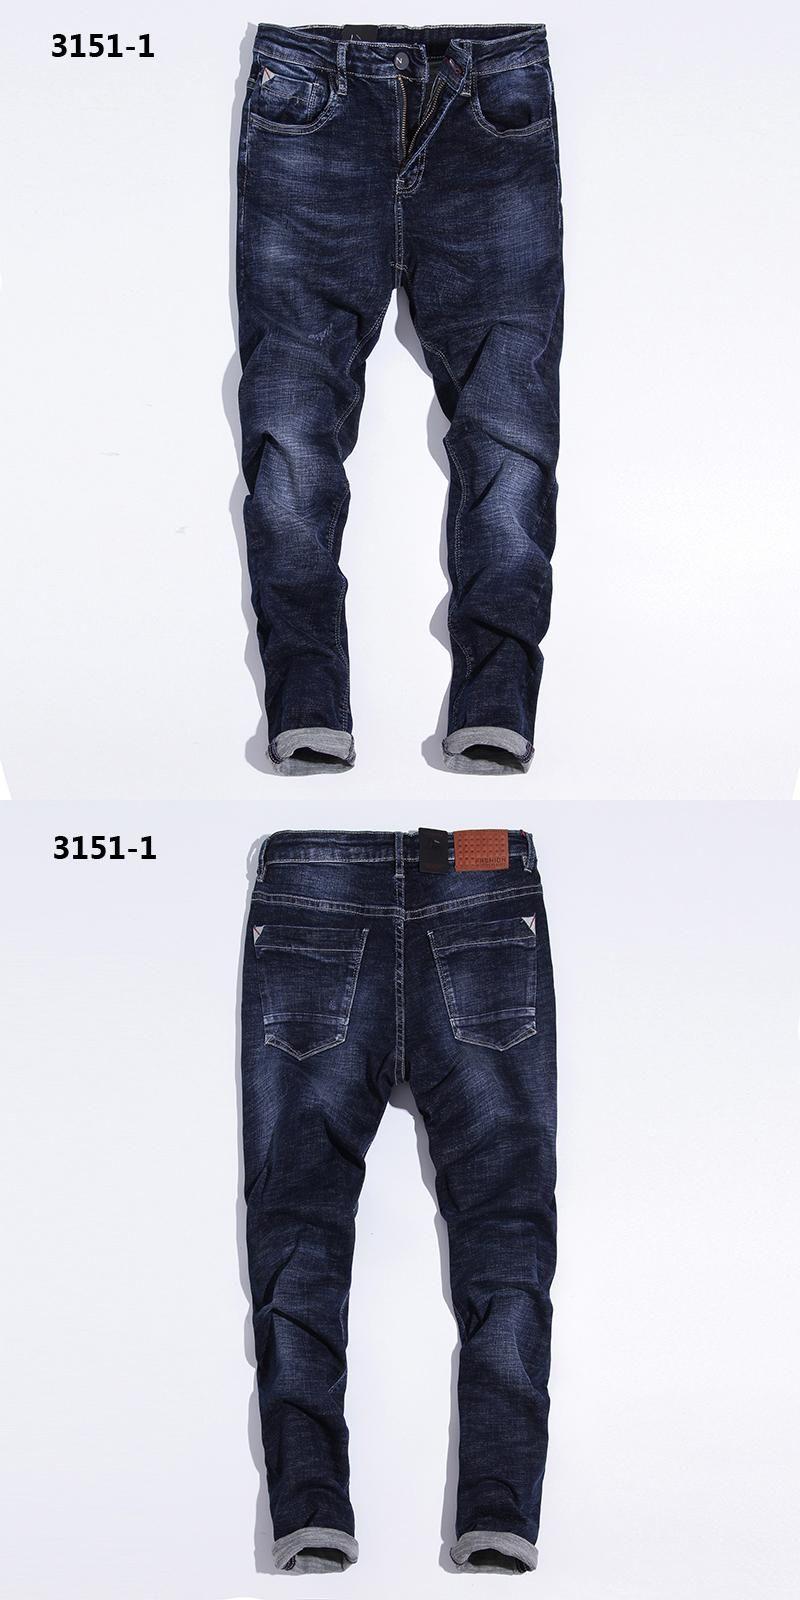 6159849327f15 28-38 Distressed Model Scratch Jeans Uomo Simple Design Stretch Jeans Men  Pants Brand Mens Blue Jeans Masculino Elastic 3151-1